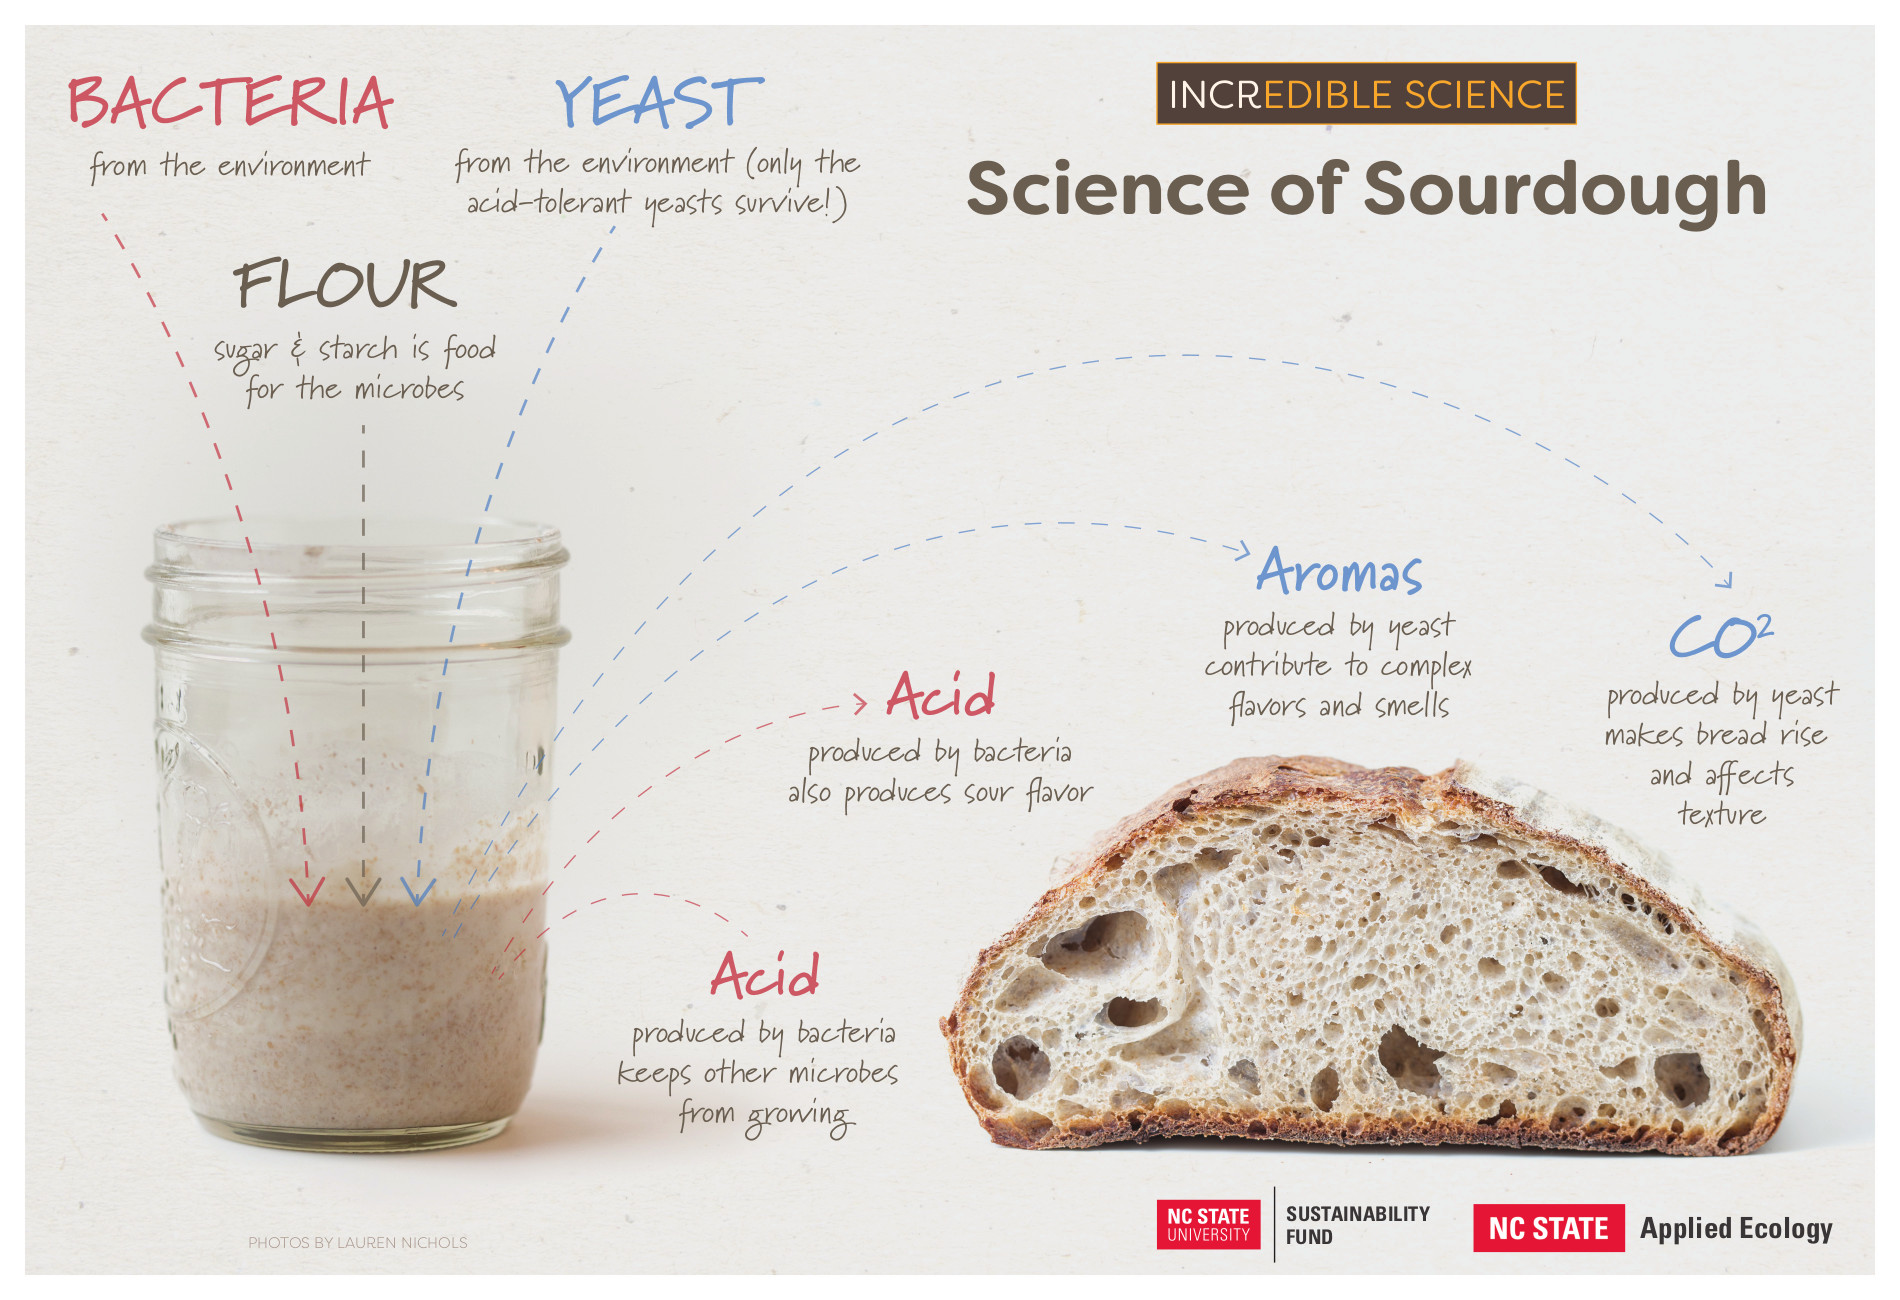 Science of Sourdough Infographic - Neil McCoy